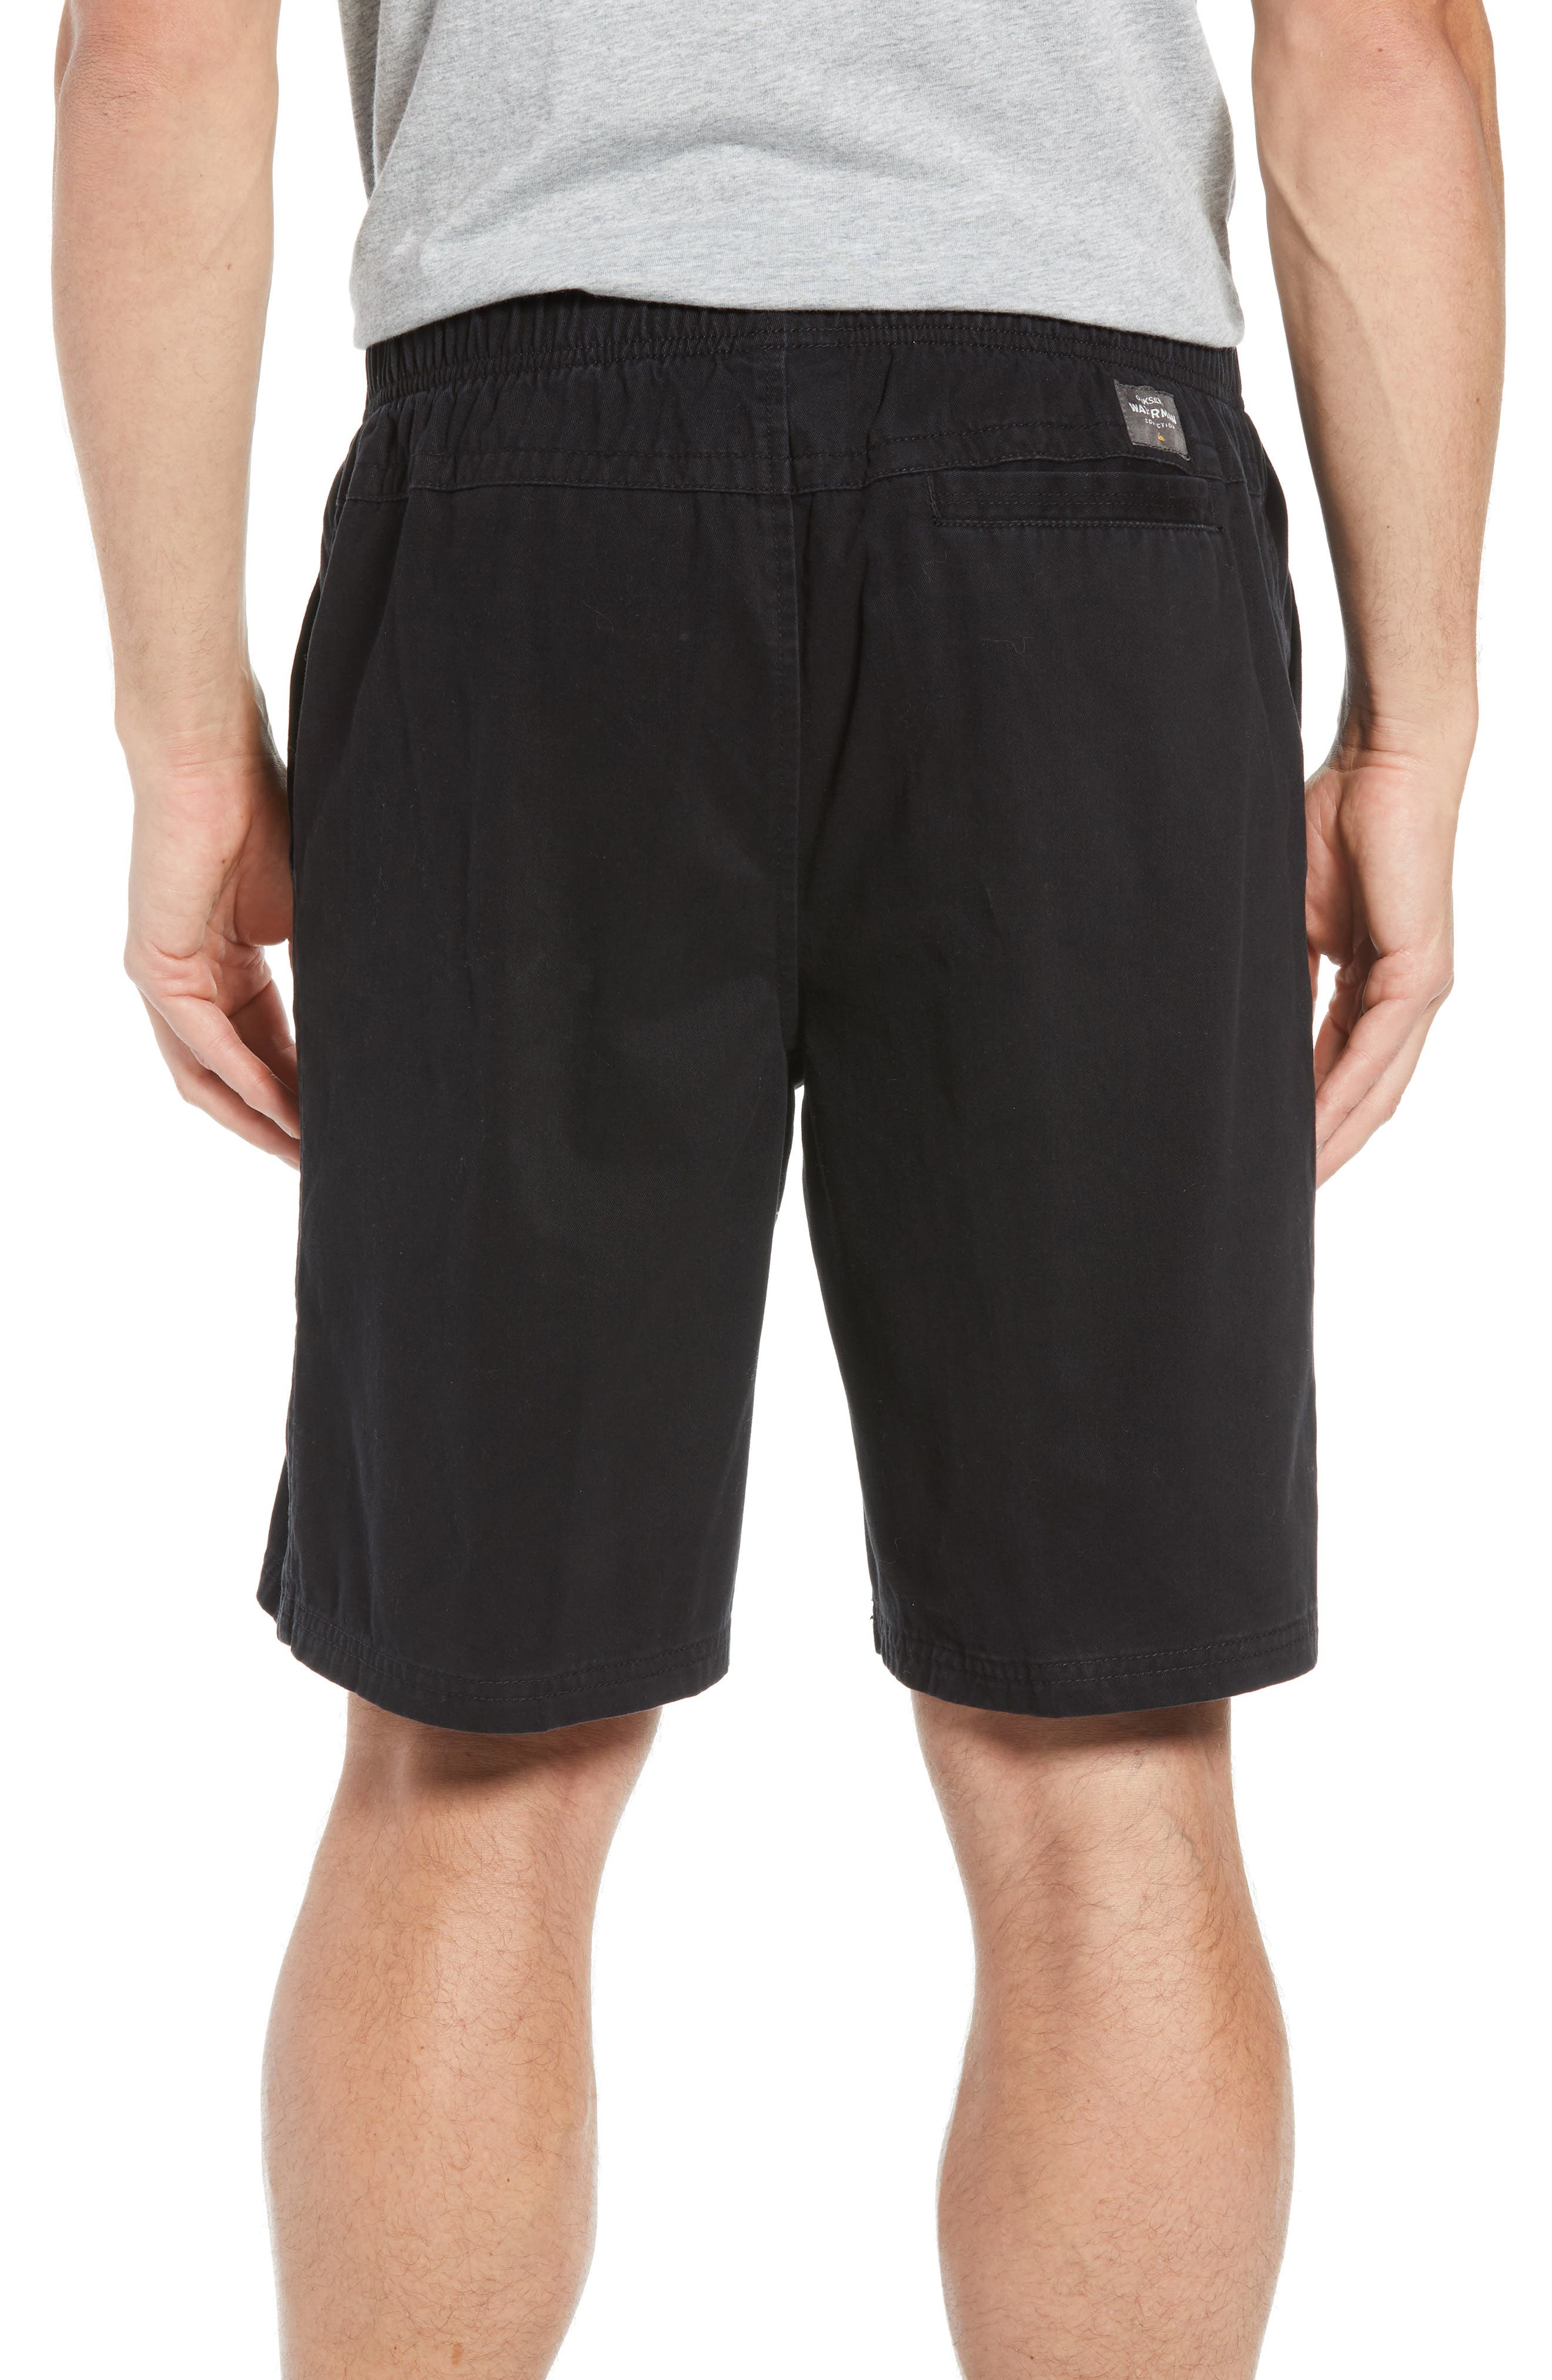 Cabo 5 Shorts,                             Alternate thumbnail 2, color,                             001